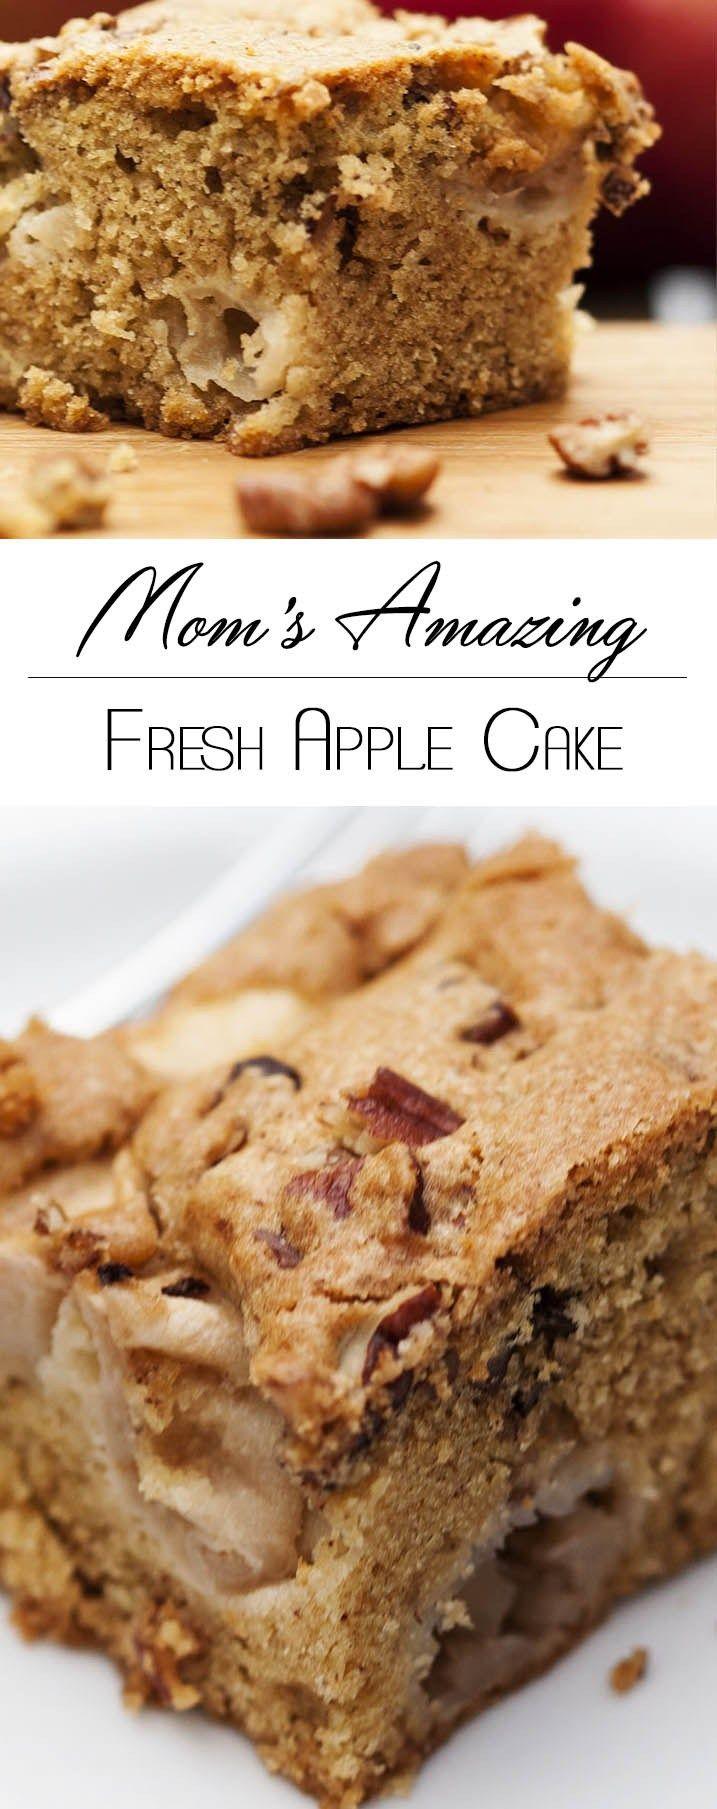 Mom's Amazing Fresh Apple Cake Recipe Apple cake